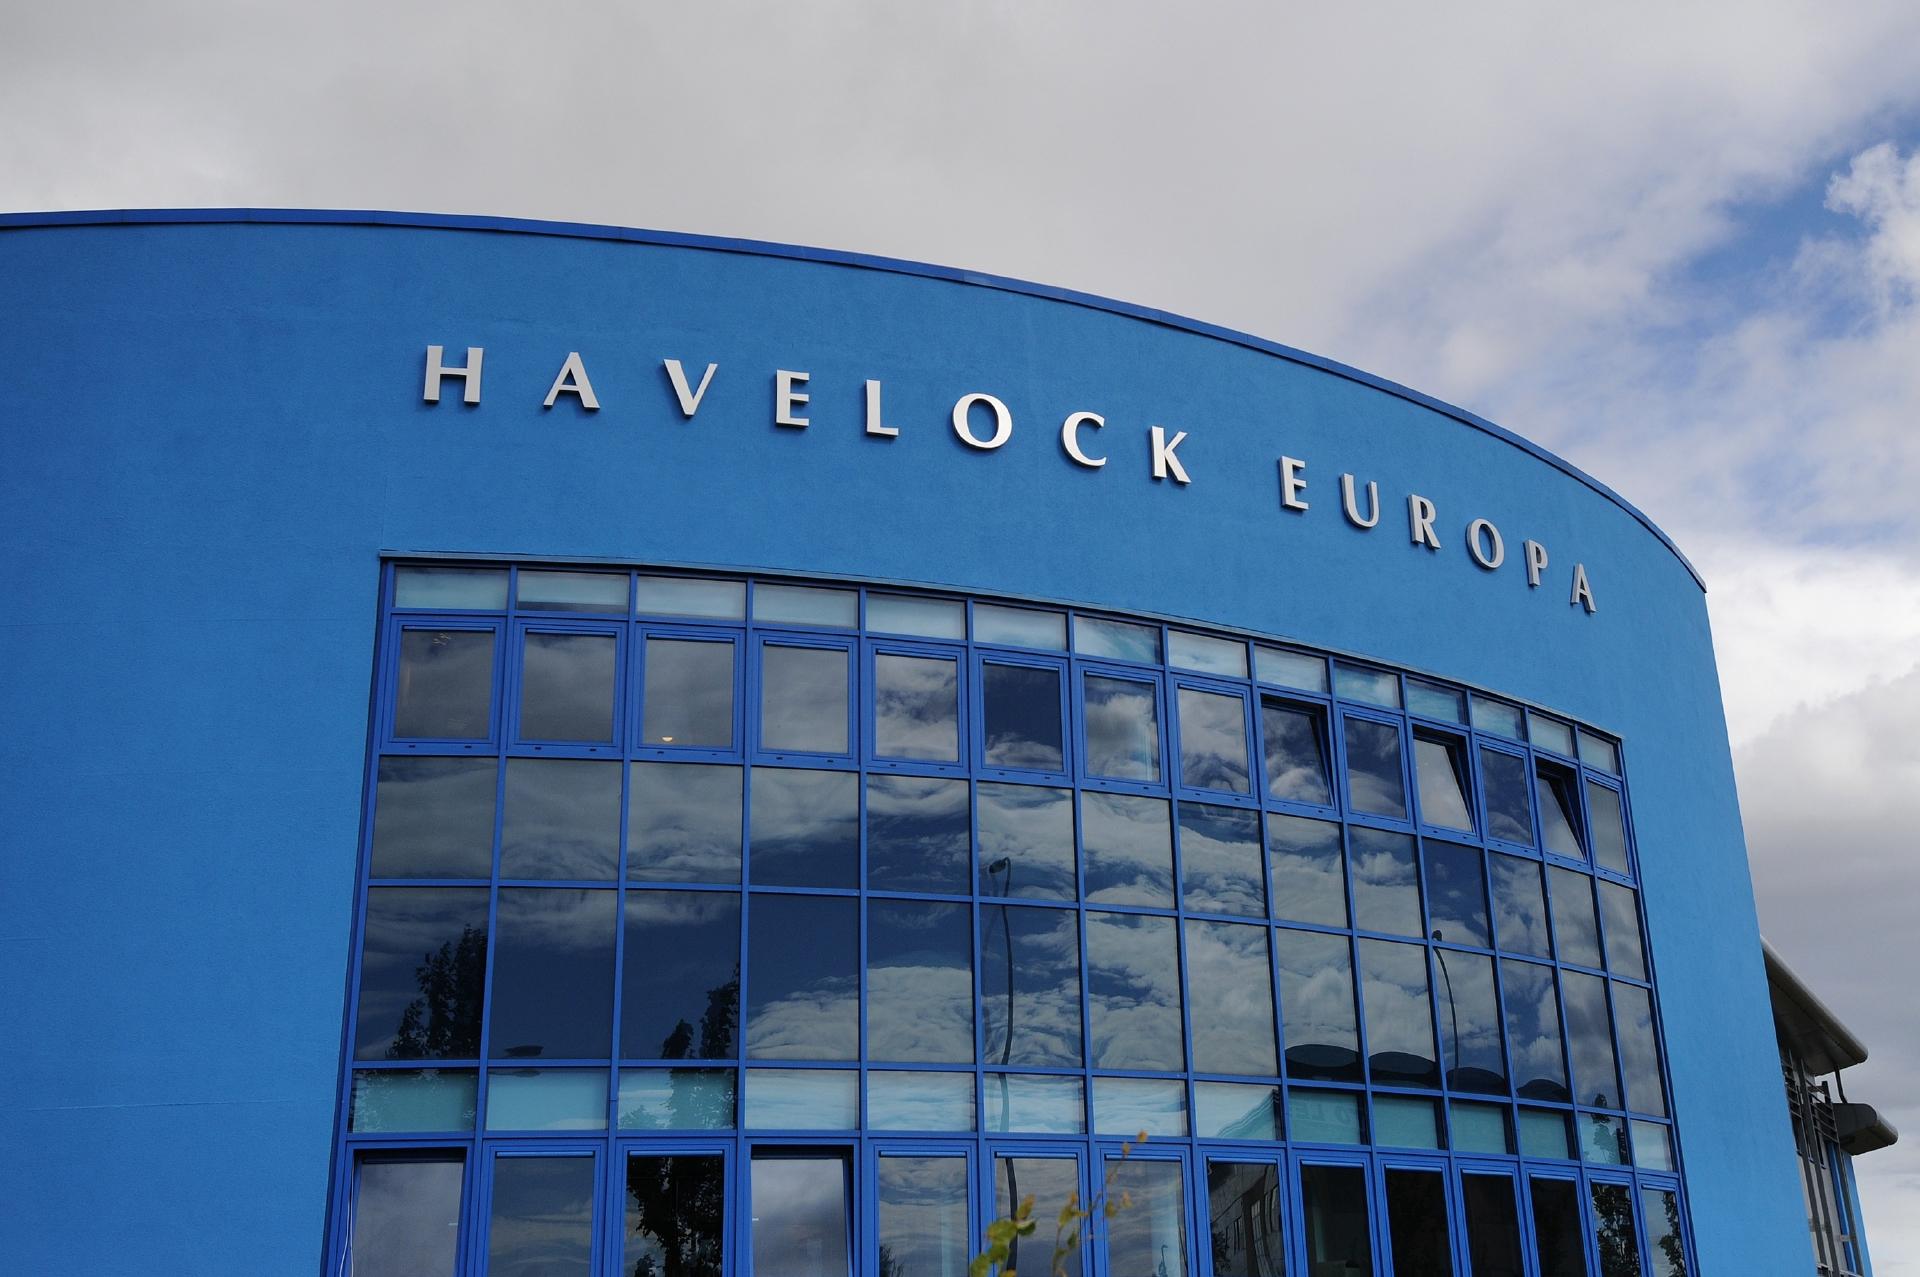 The Havelock Europa premises in the John Smith Business Park, Kirkcaldy